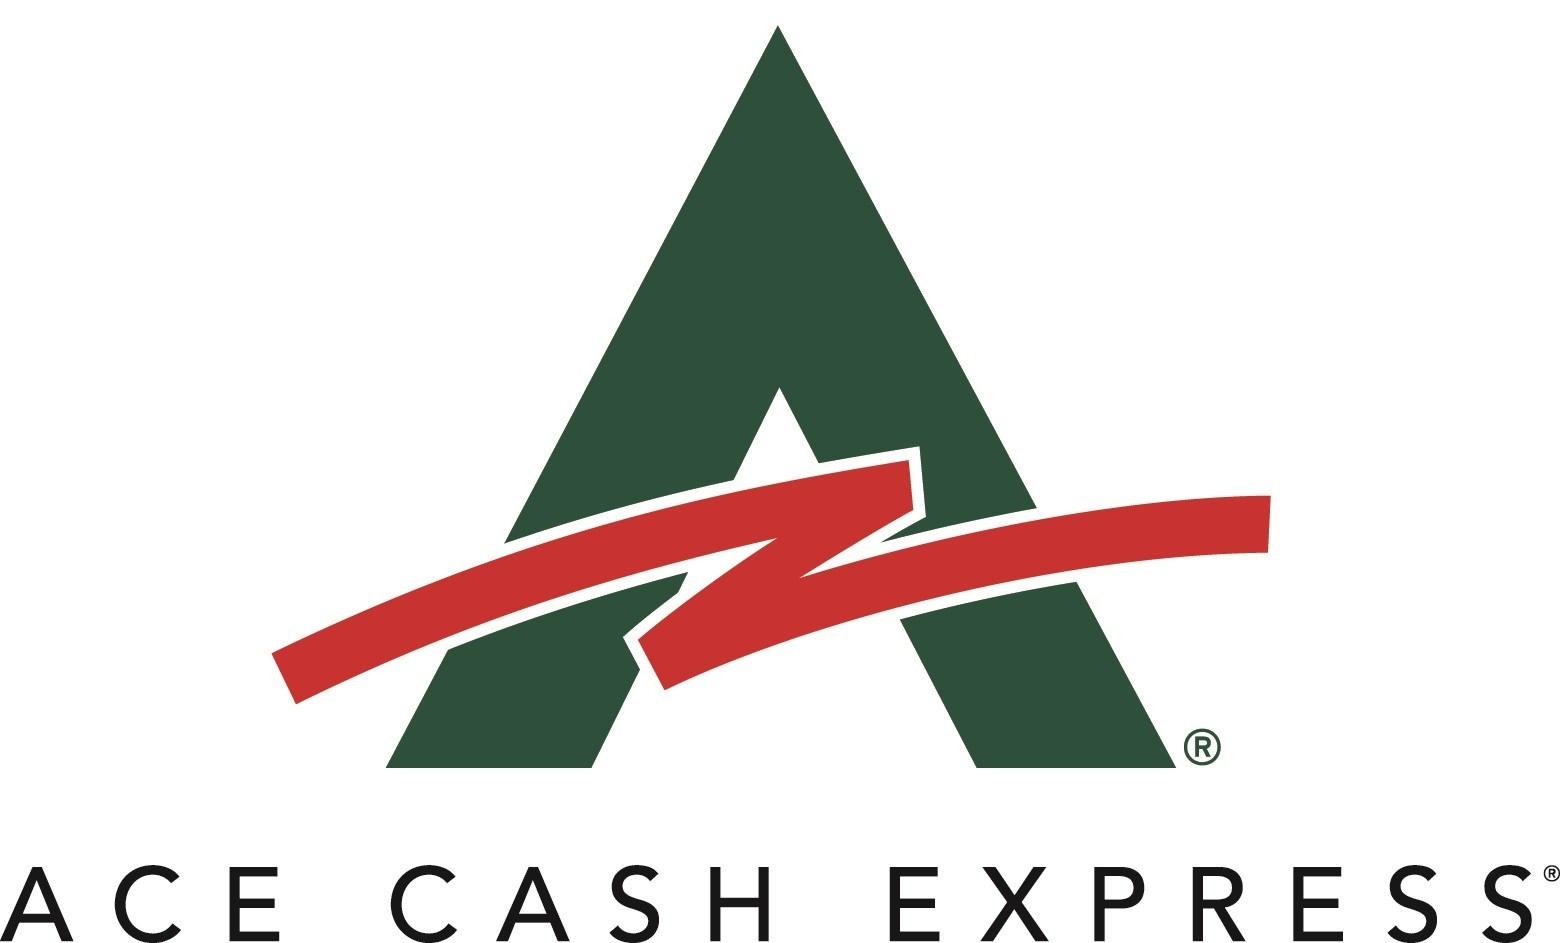 ACE Cash Express.  (PRNewsFoto/ACE Cash Express, Inc.) (PRNewsfoto/ACE Cash Express, Inc.)